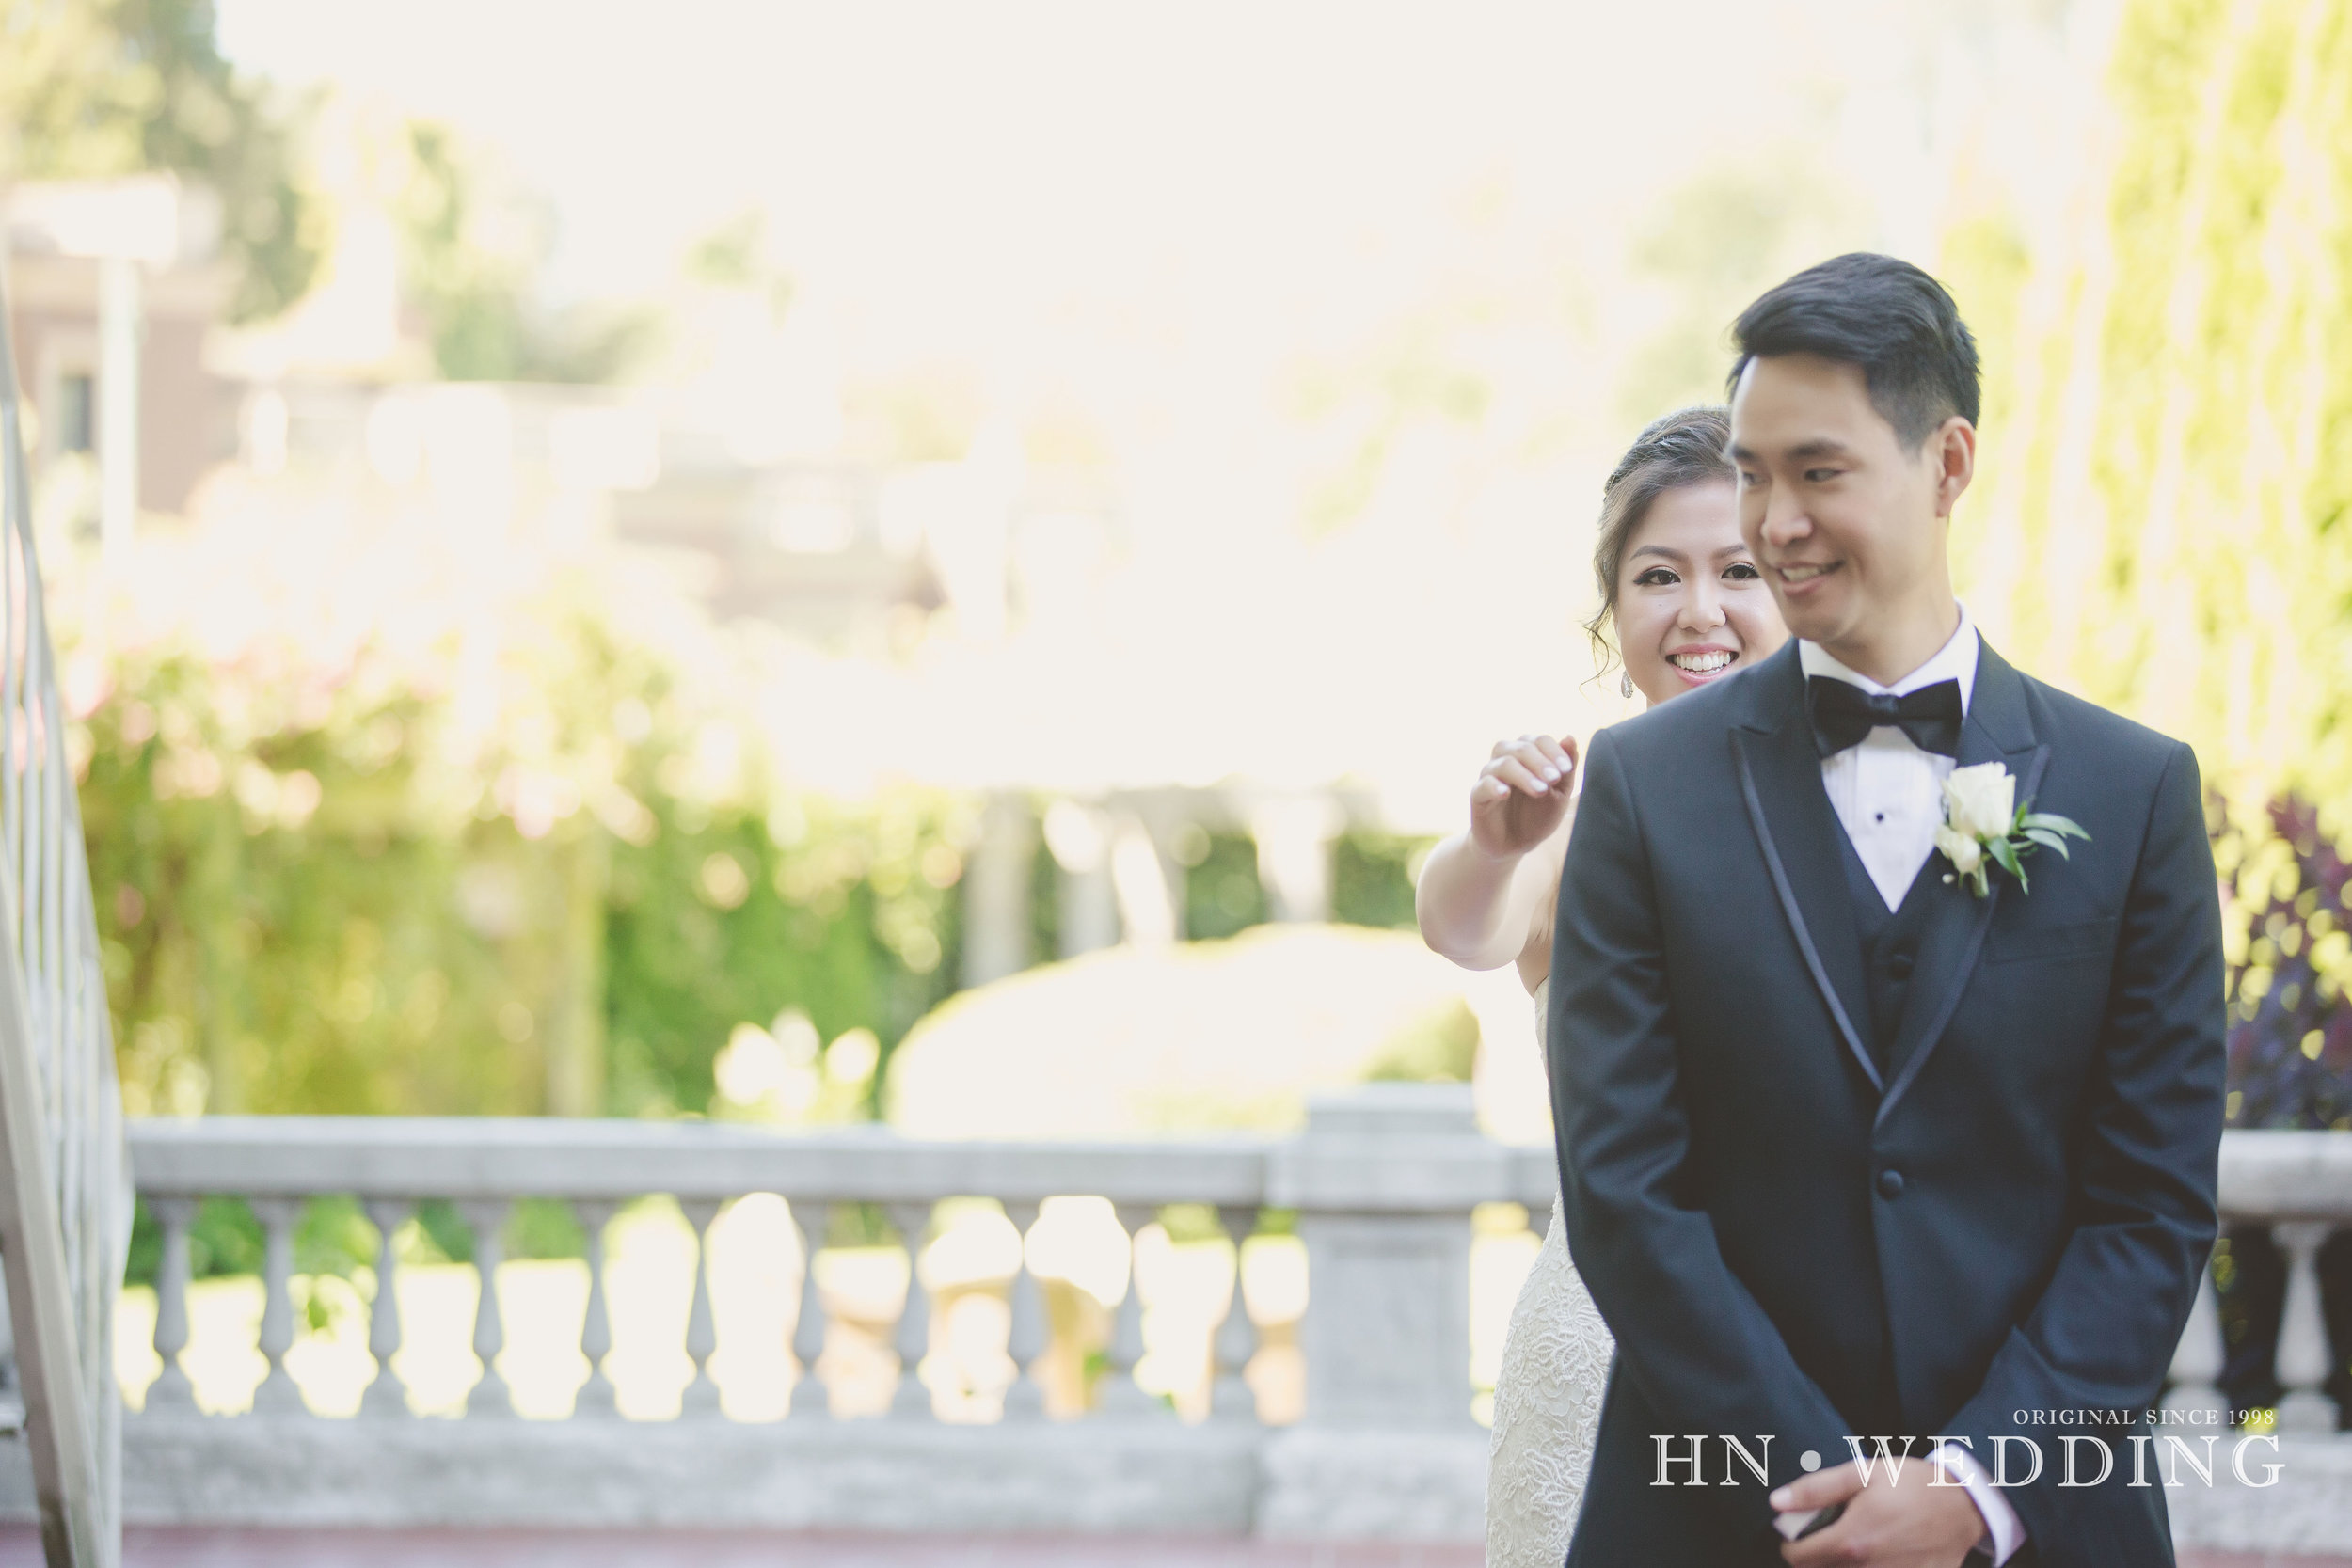 HNwedding-weddingday-20170729--34.jpg